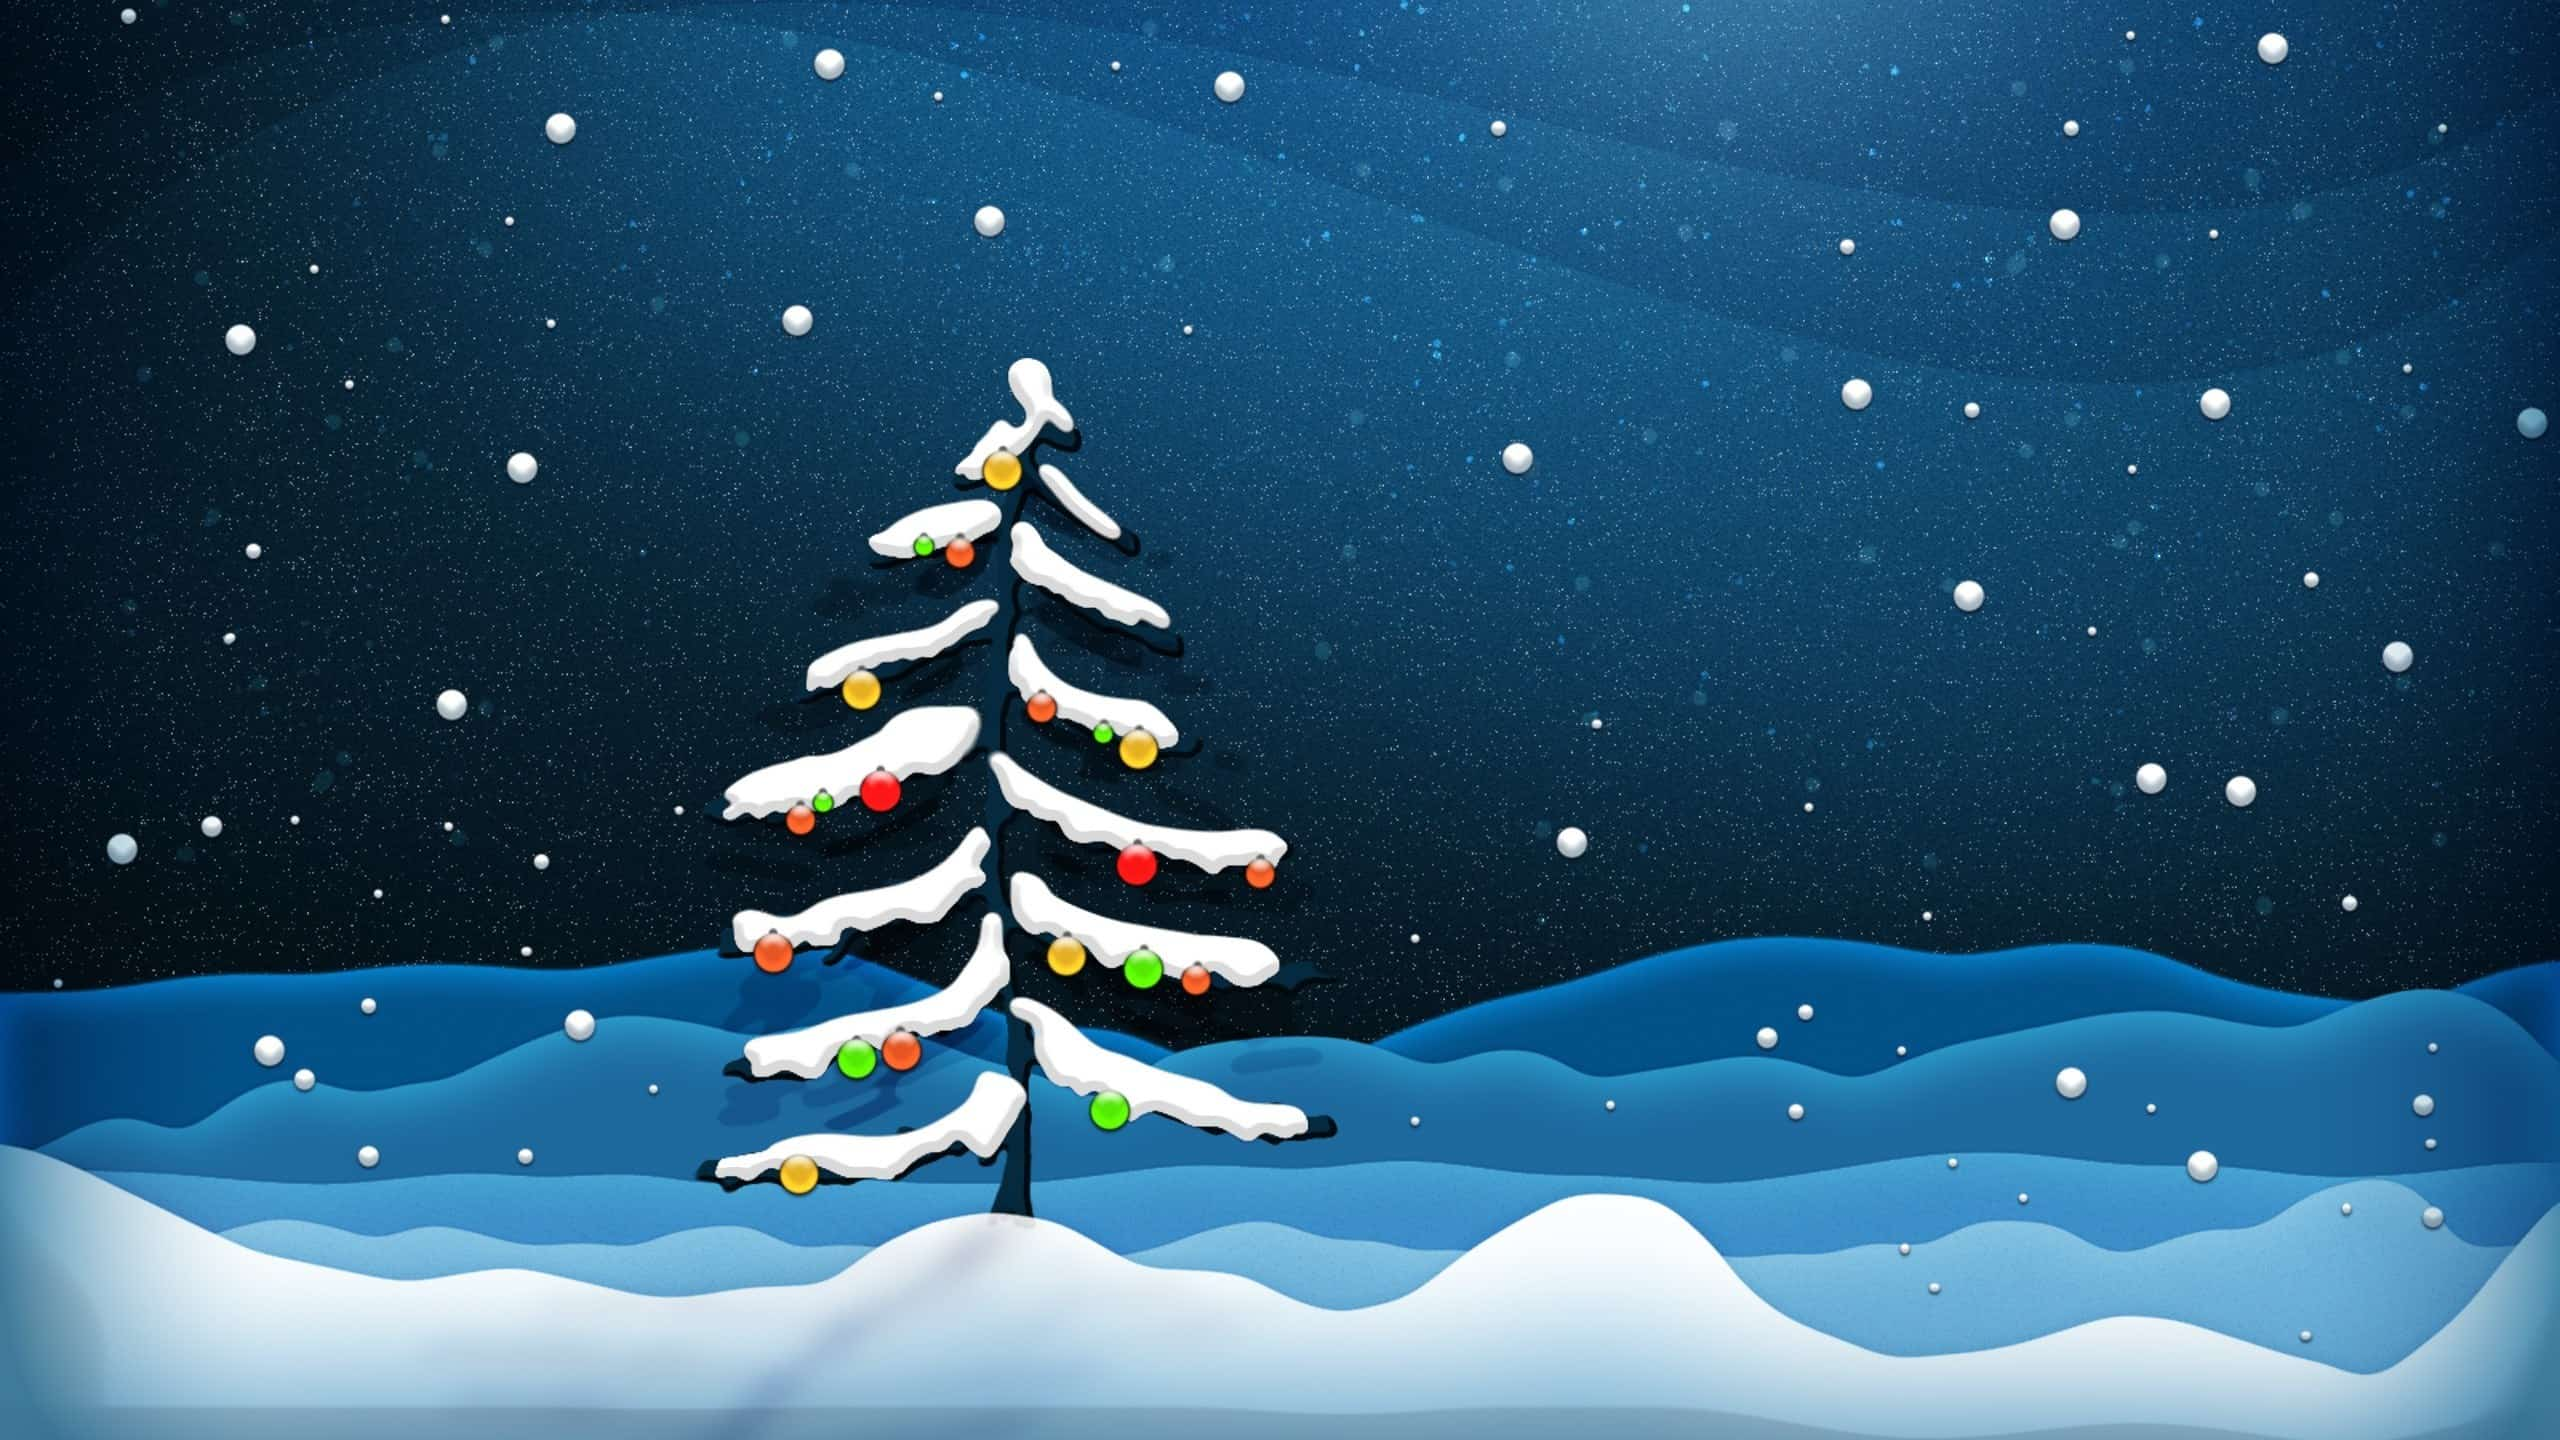 Christmas Winter Wallpaper 017